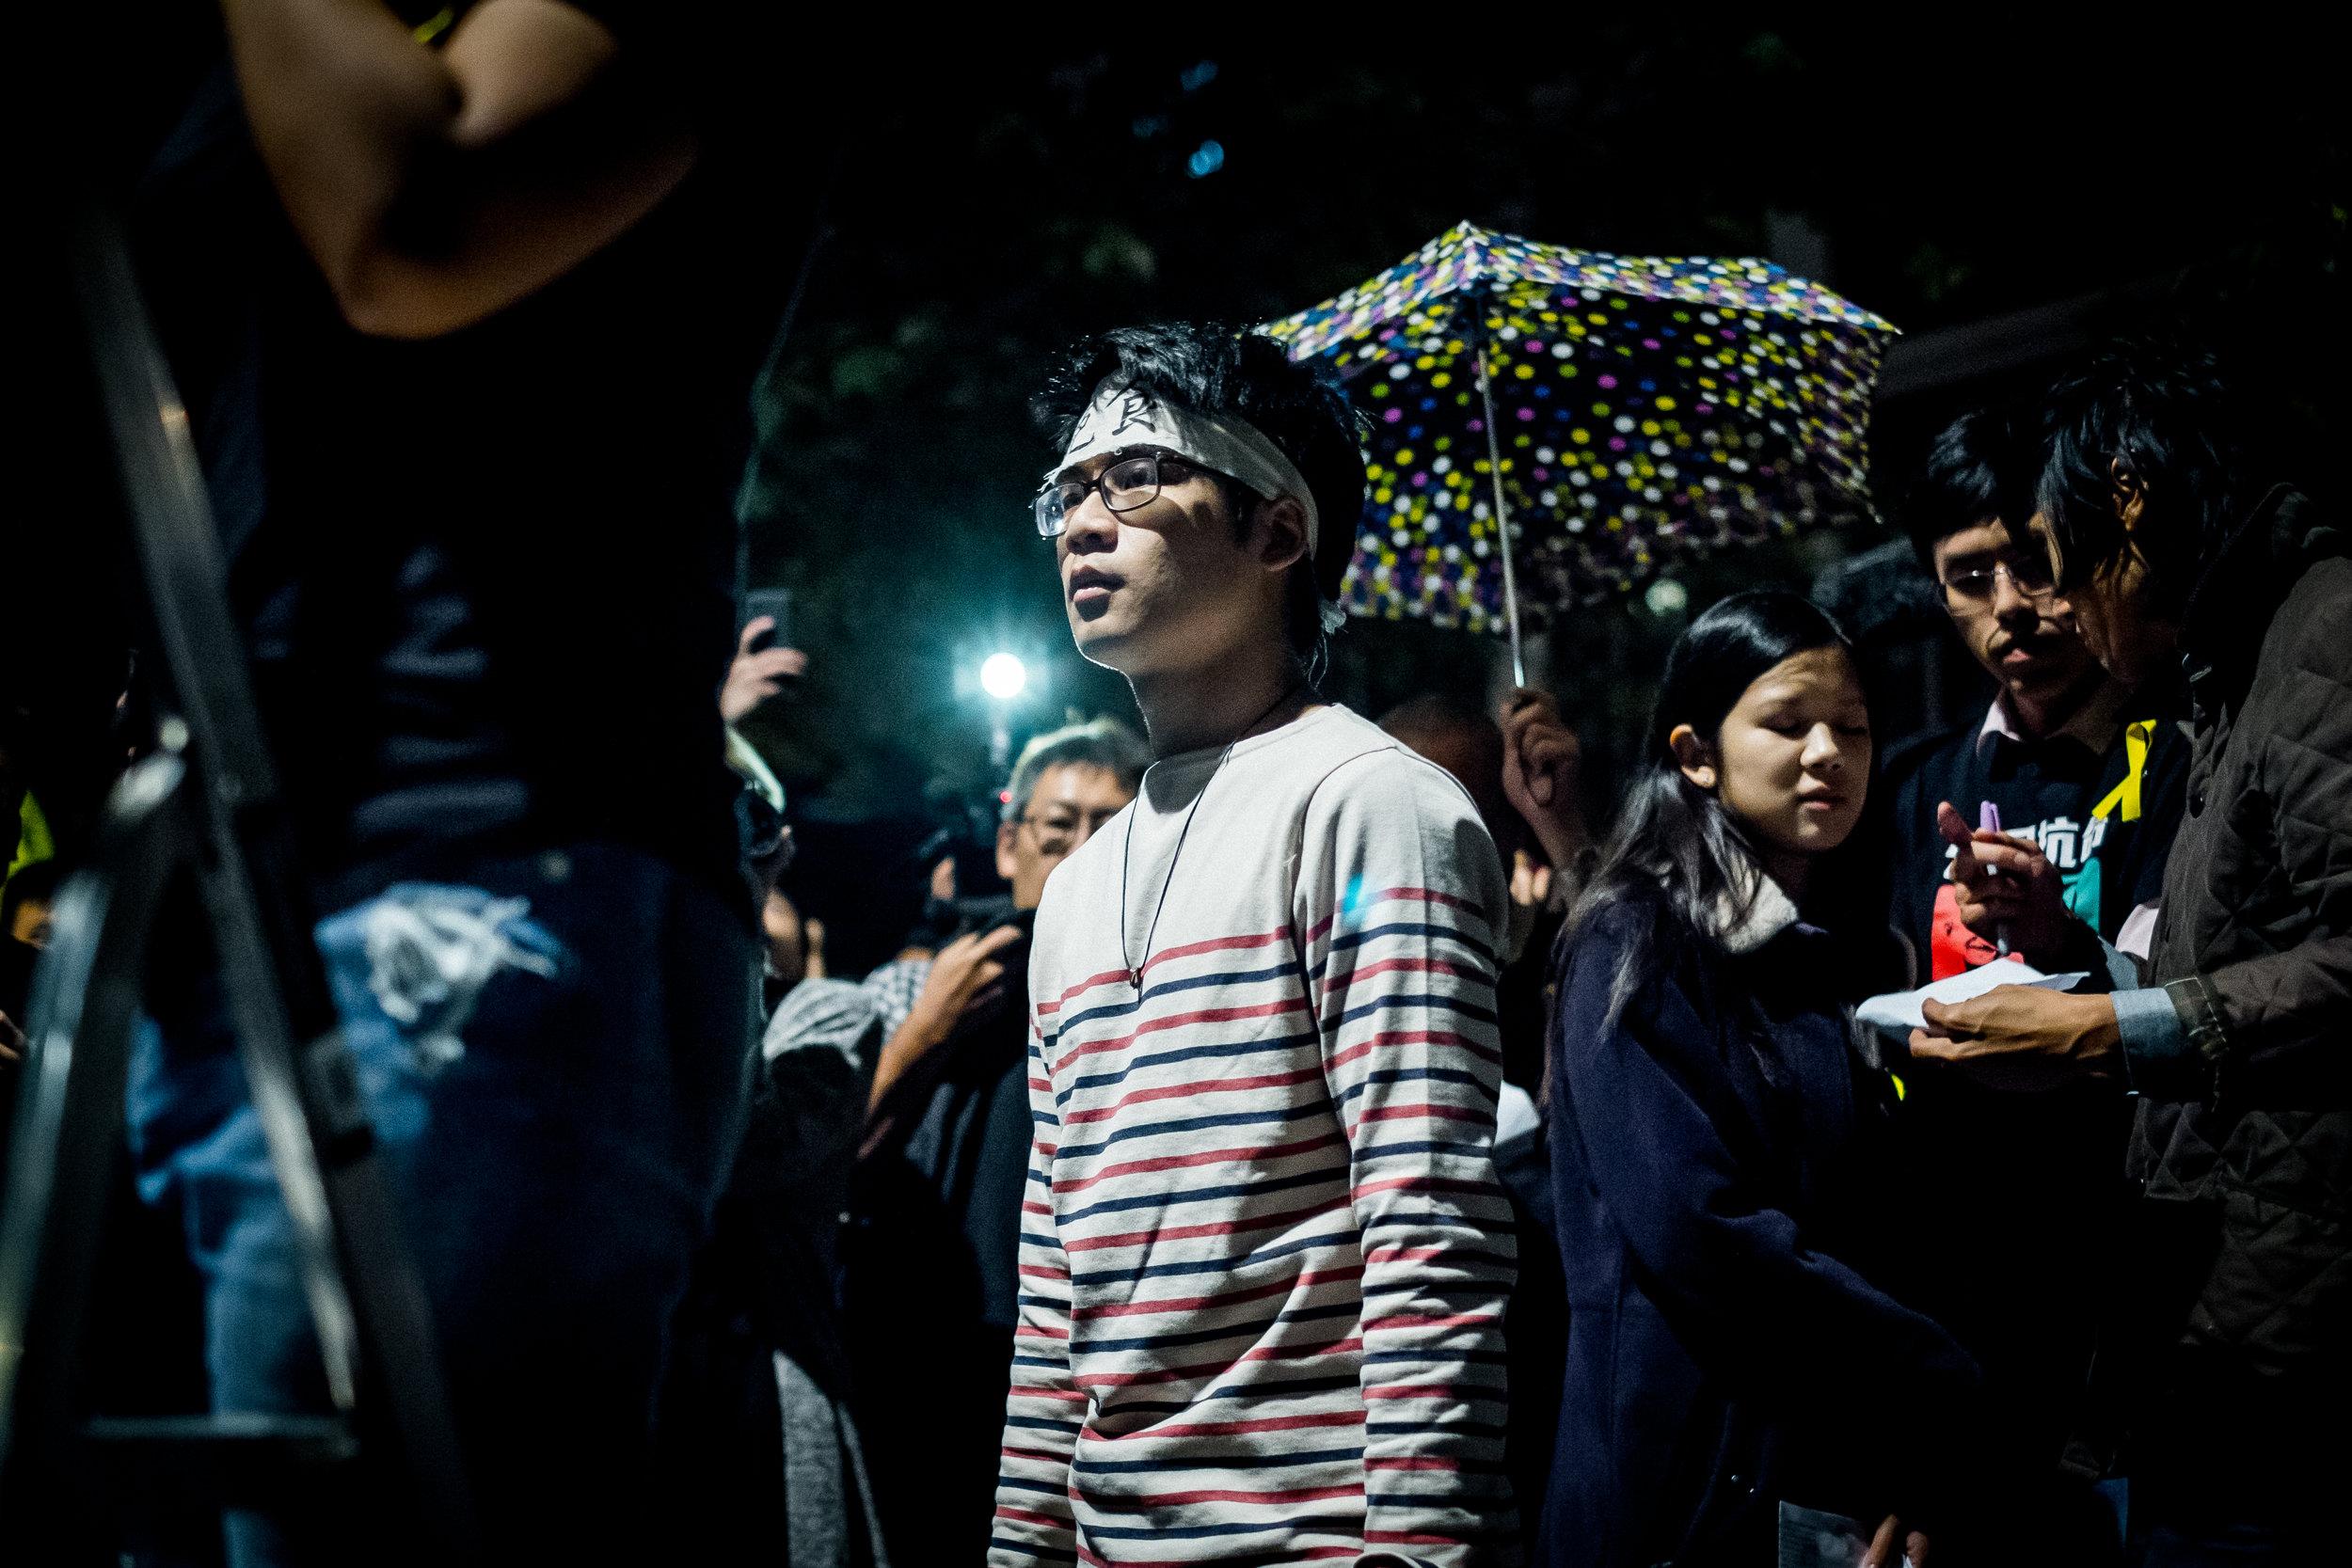 Chinese Embassy Protest 011014 - Suki Mok-11.jpg